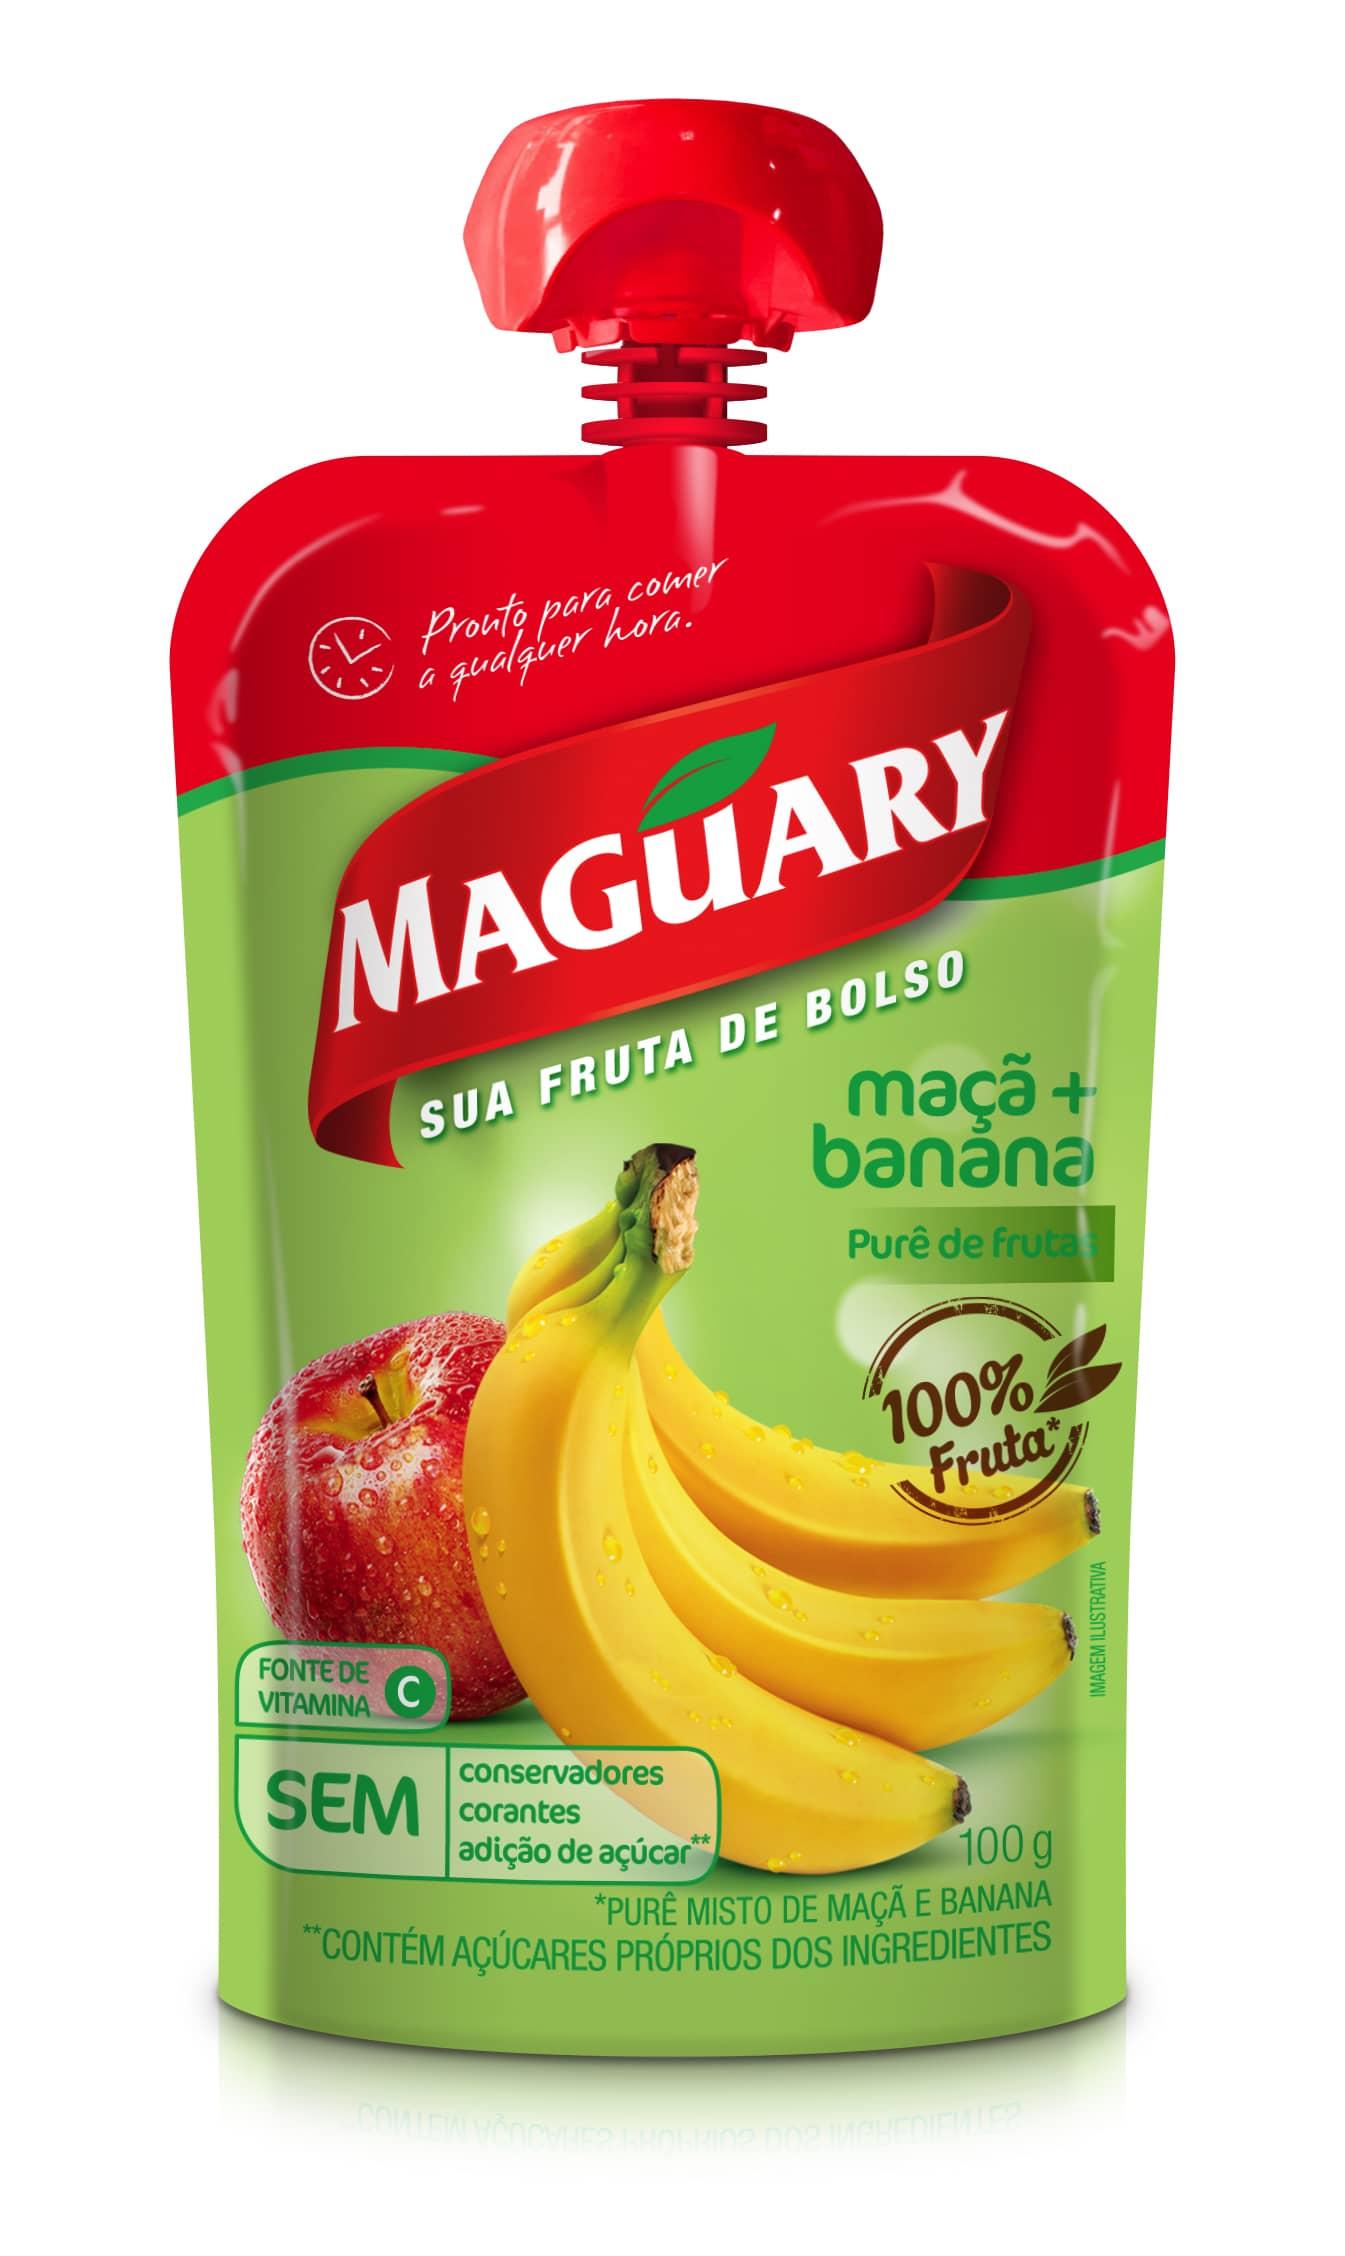 AF_Maguary_Mockup_Pure_Banana_140813